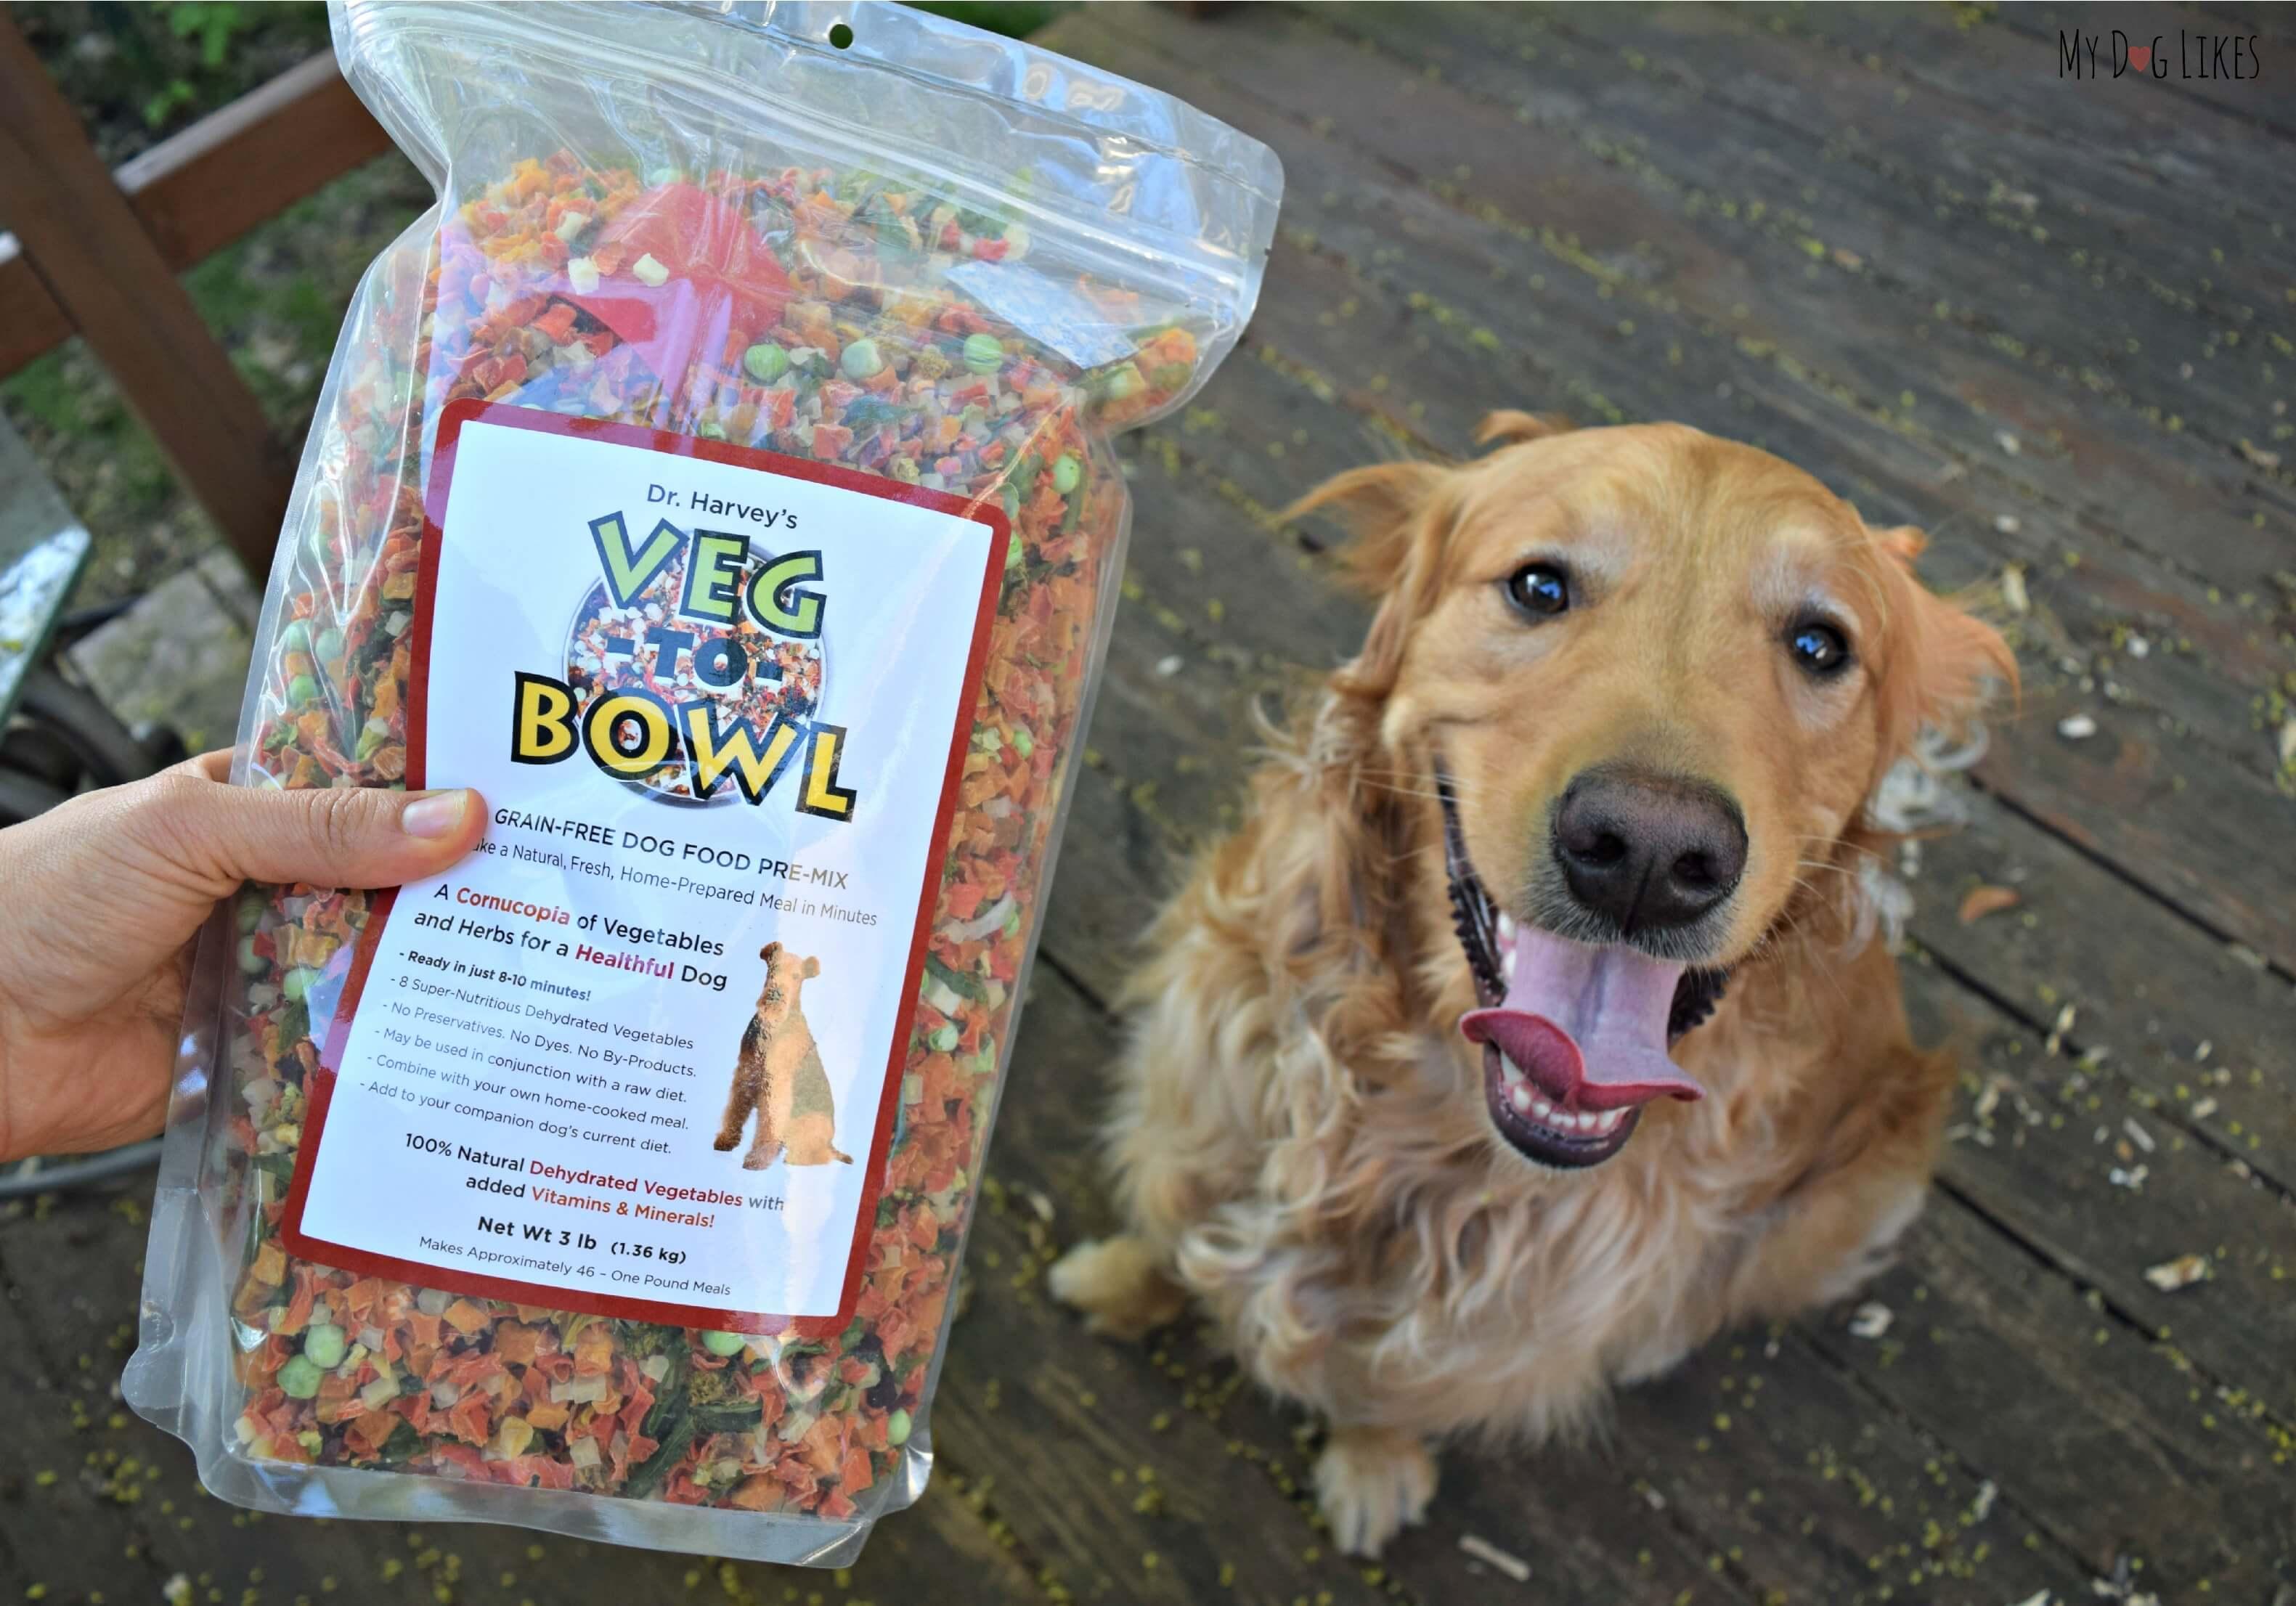 Regaling Doc Knows Dog Food Review Dinovite Dog Food Where To Buy Dinovite Dog Food Ratings houzz-03 Dinovite Dog Food